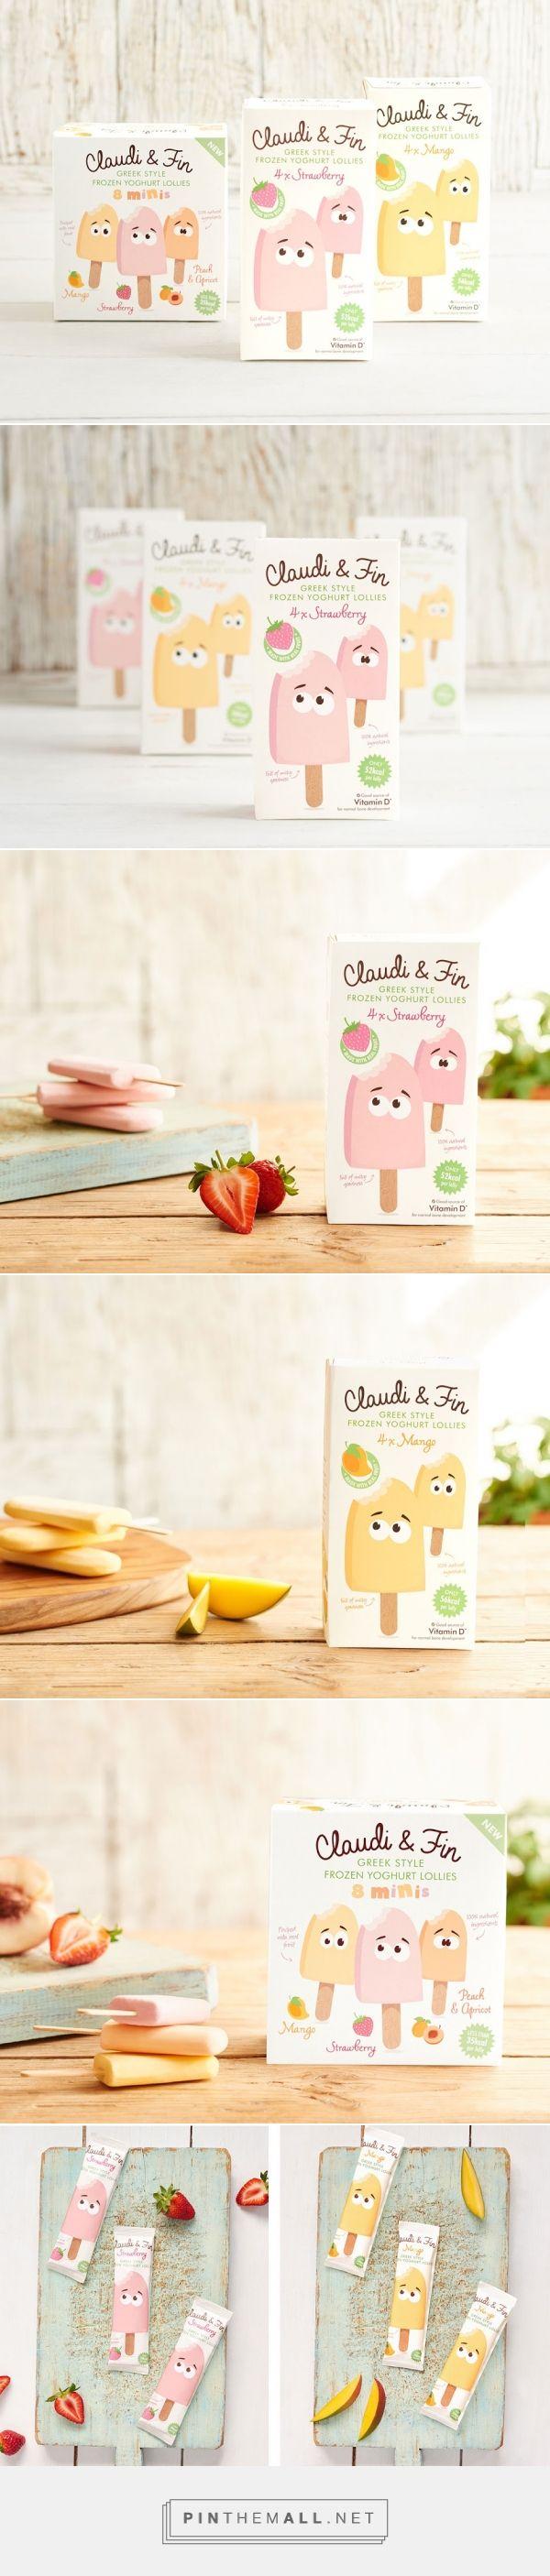 Claudi & Fin - Packaging of the World - Creative Package Design Gallery - http://www.packagingoftheworld.com/2016/04/claudi-fin.html